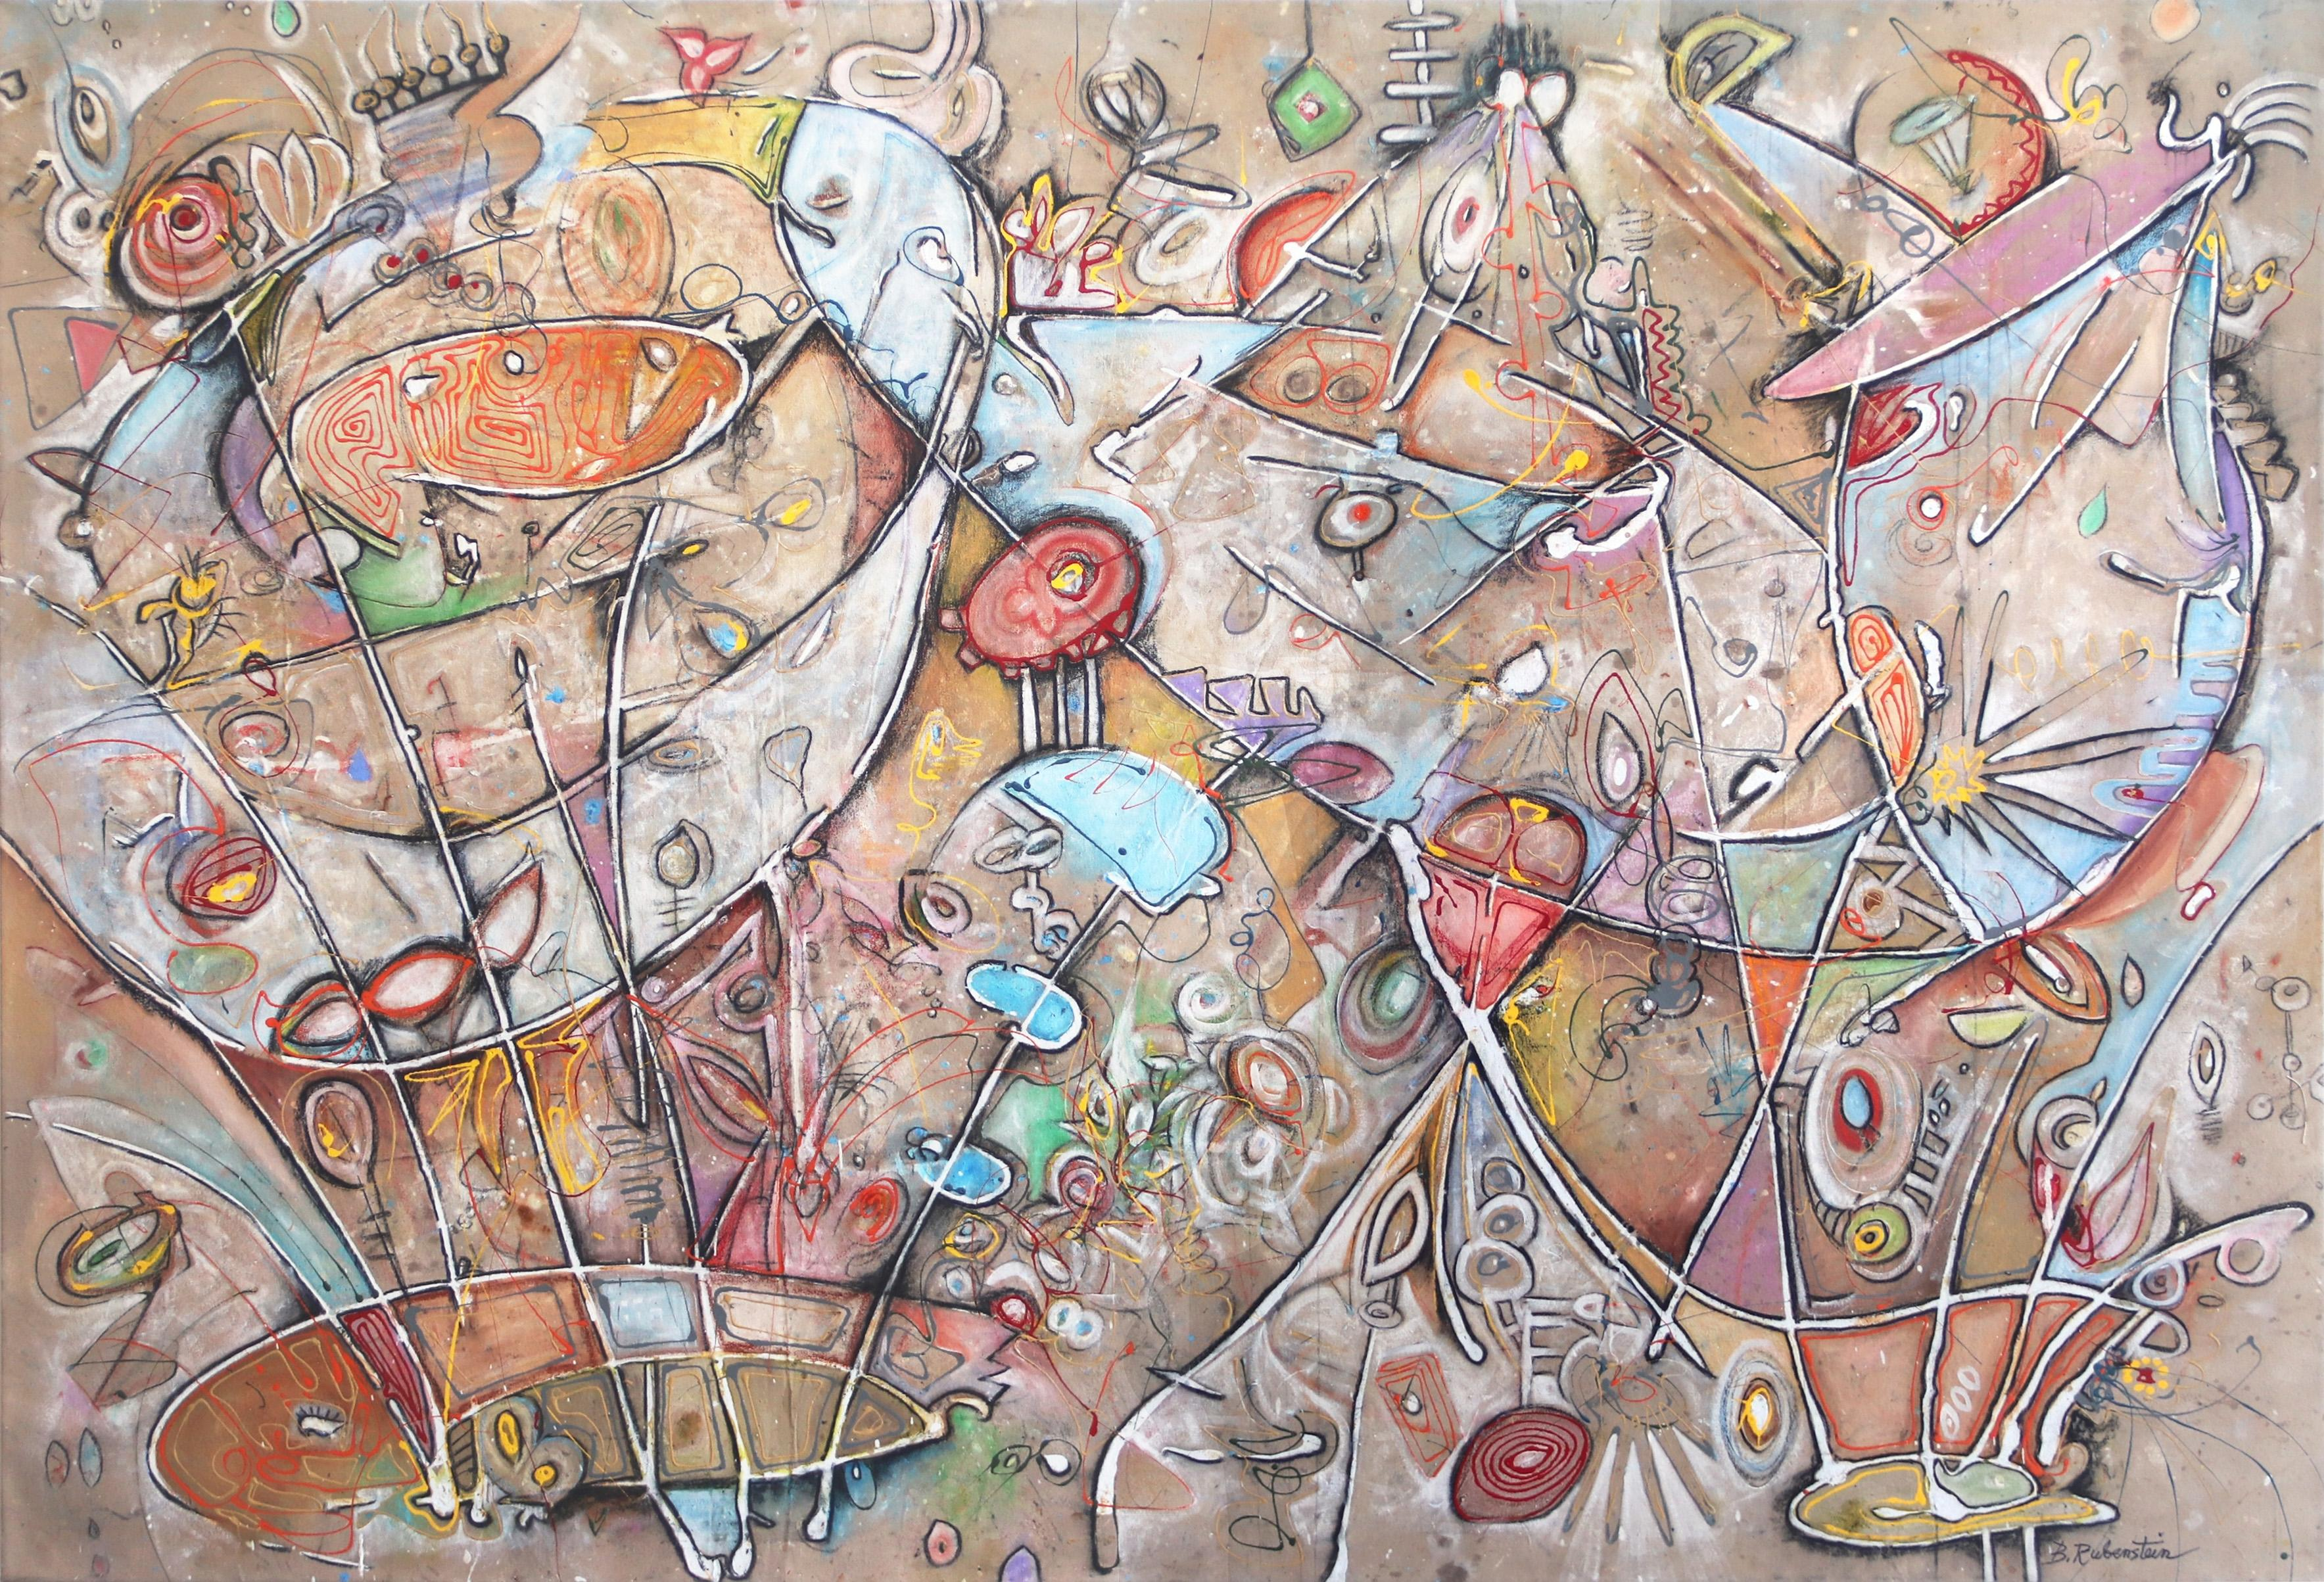 Jason and The Argonauts- large scale original artwork